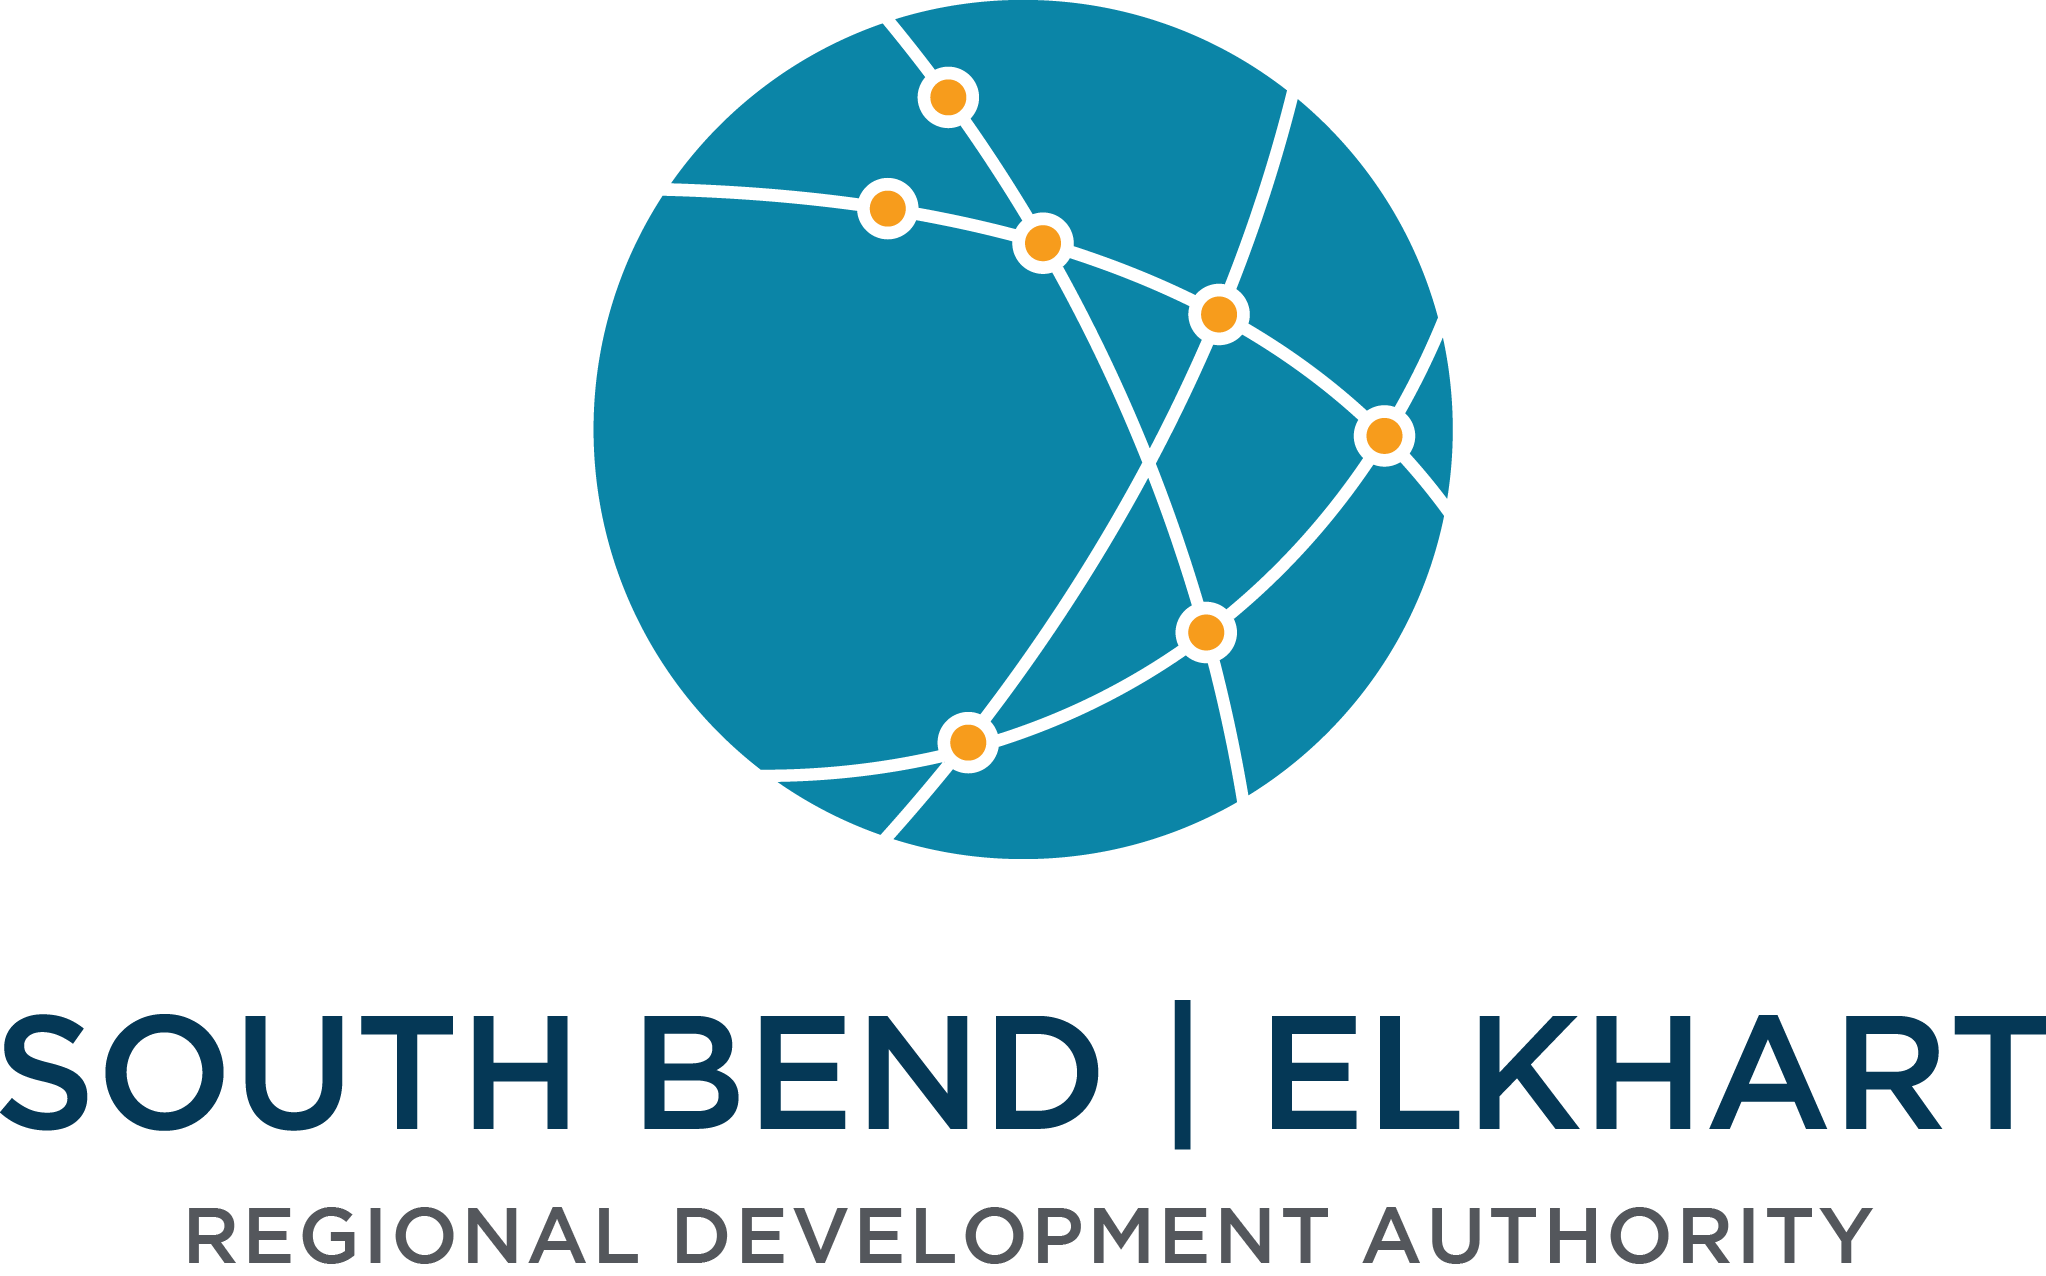 South Bend - Elkhart Regional Development Authority